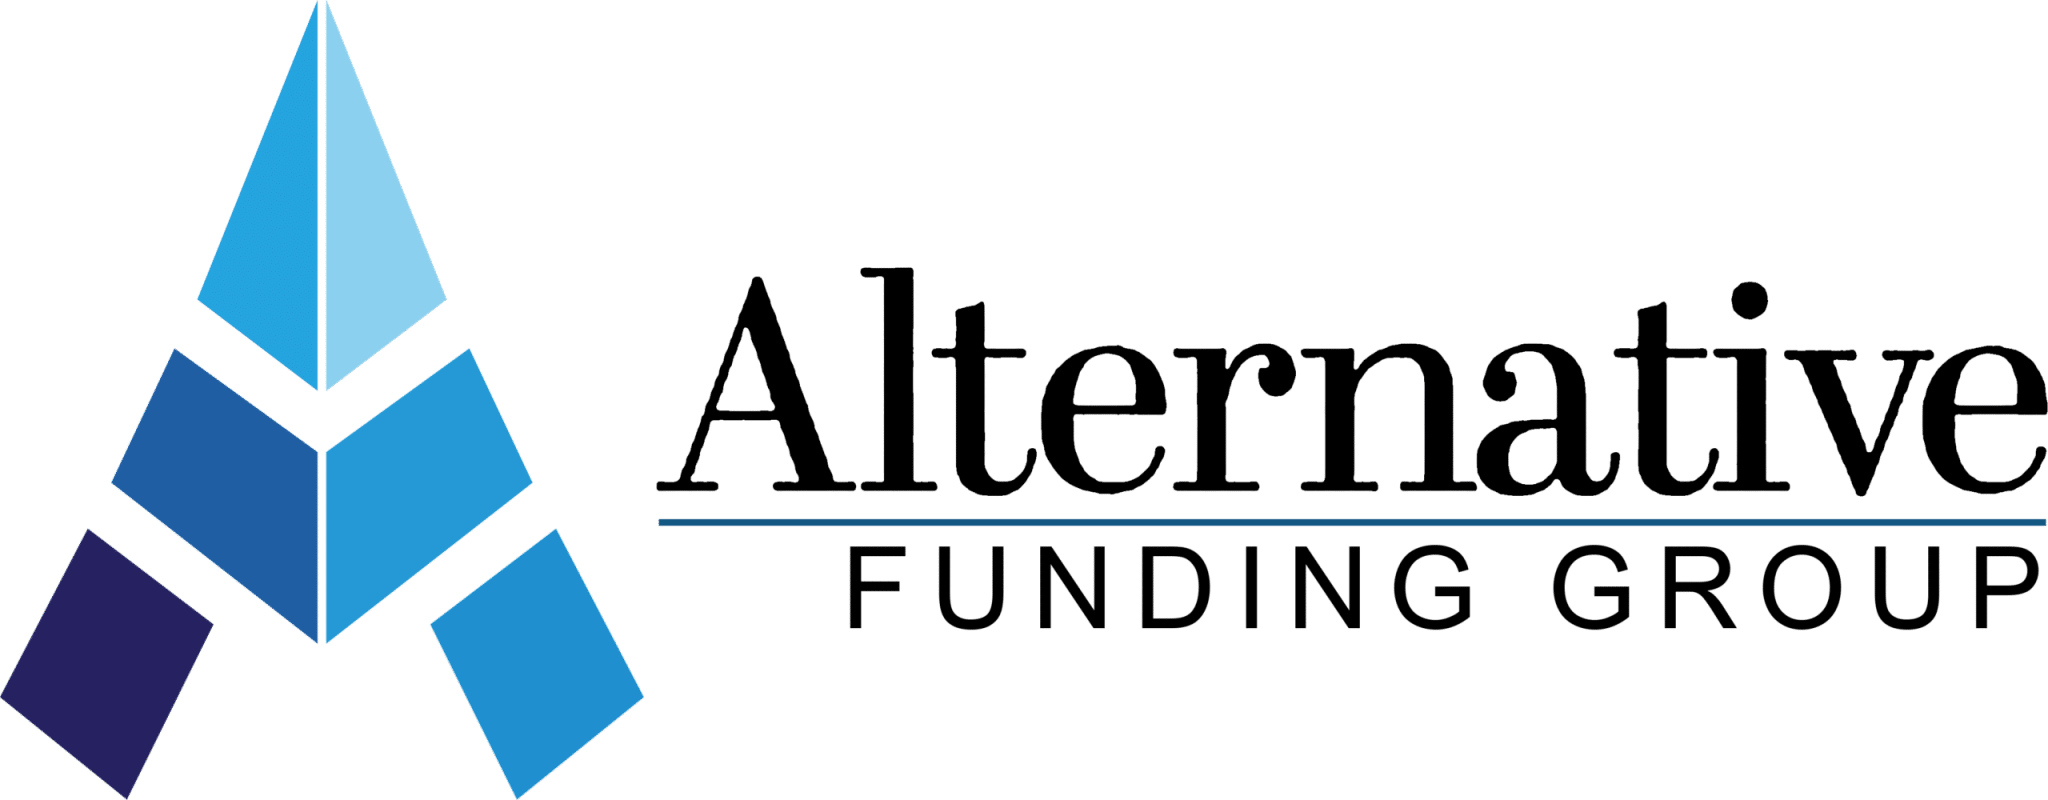 Alternative Funding